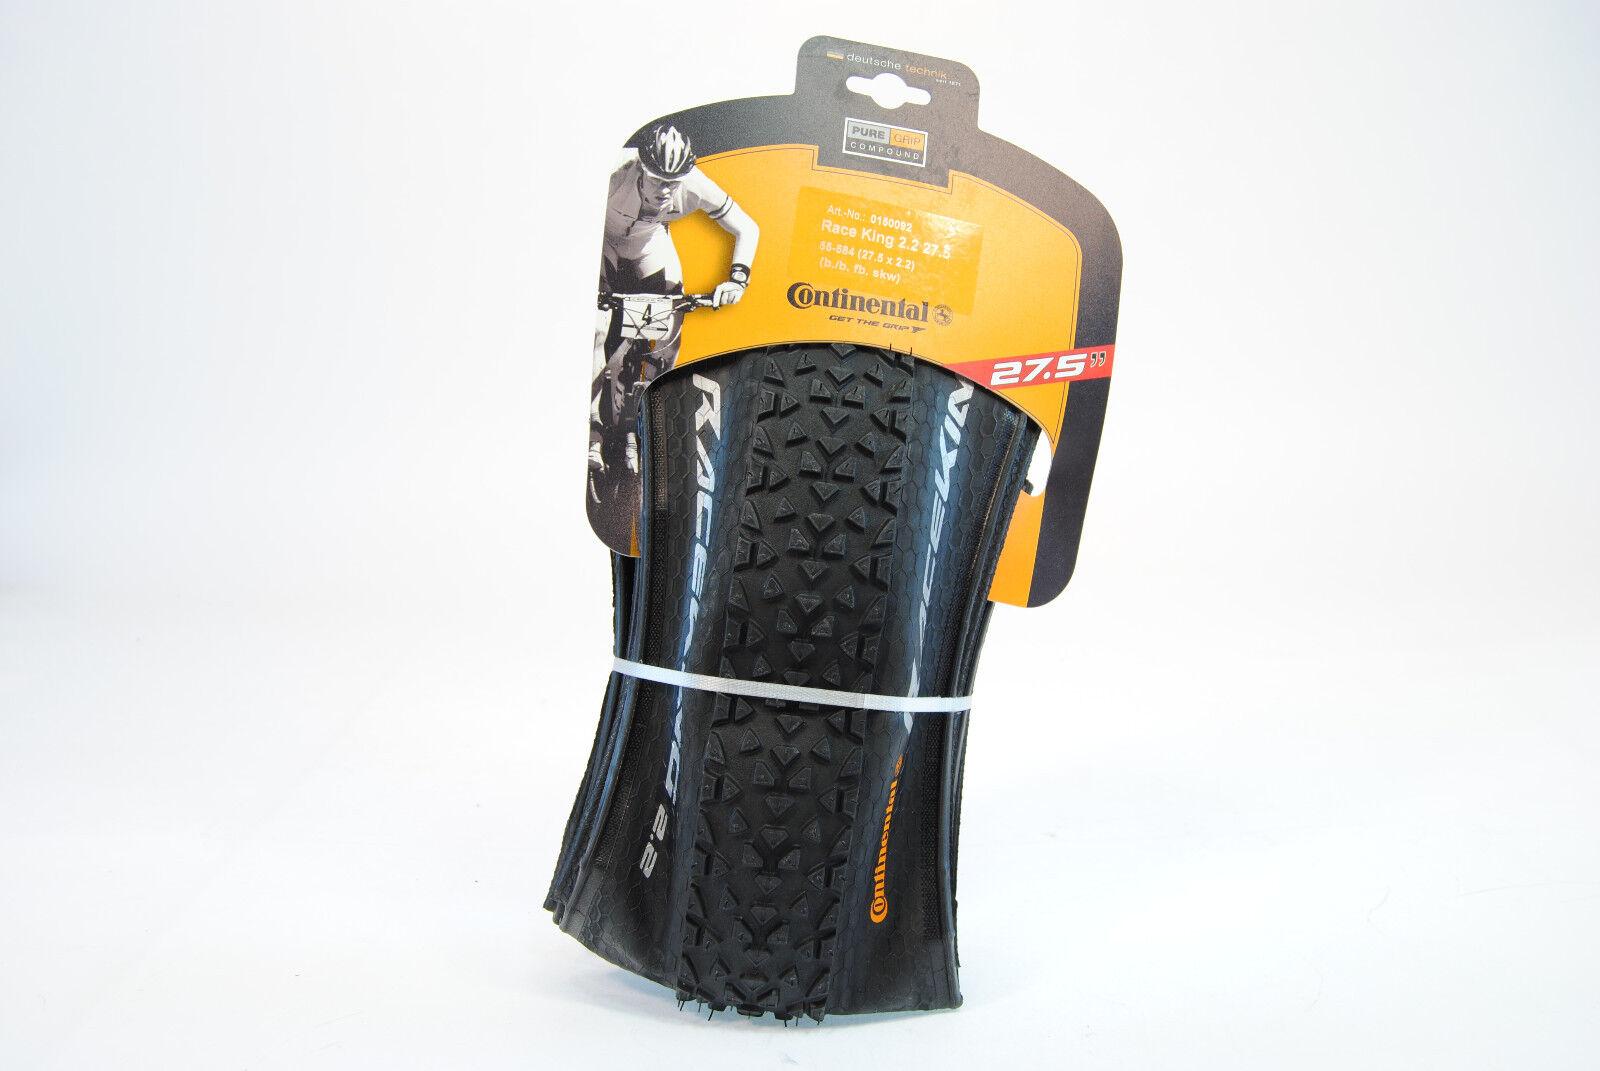 Continental Race King Tubeless 27.5 X 2.2  Folding Mountain Bike Tire 585g